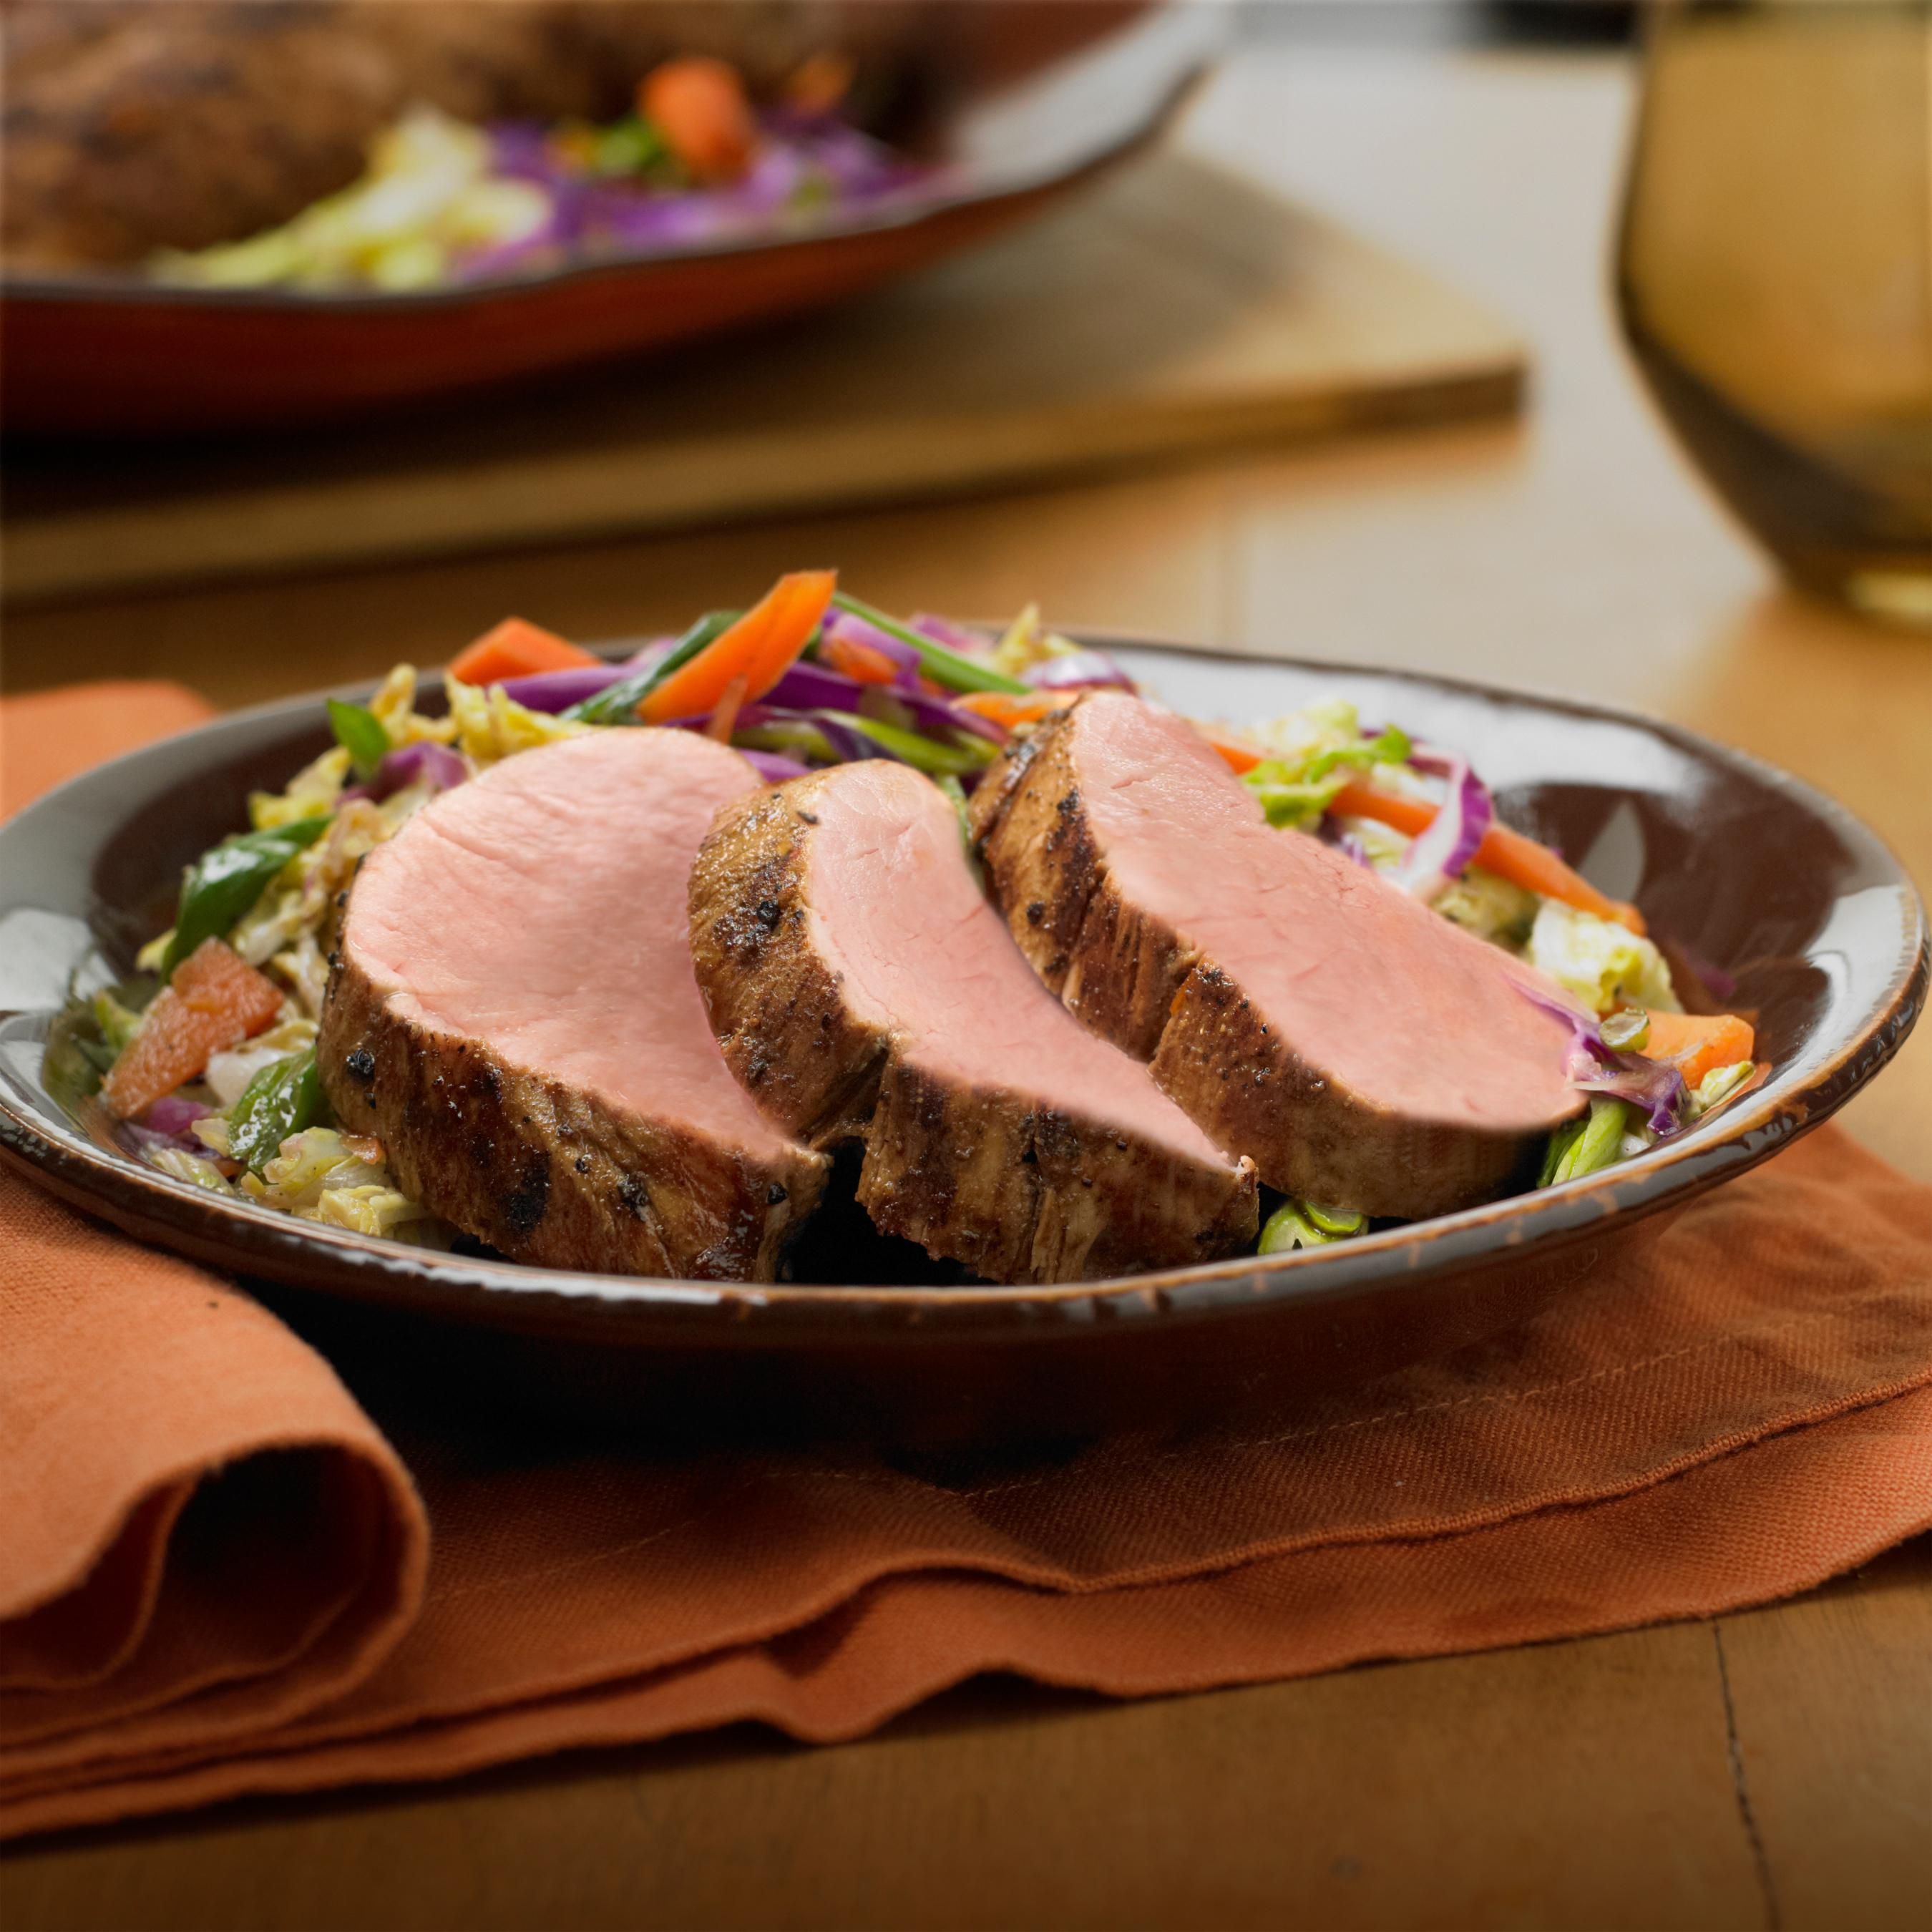 ... with Napa Cabbage & Carrot Stir-Fry - Pork Recipes - Pork Be Inspired